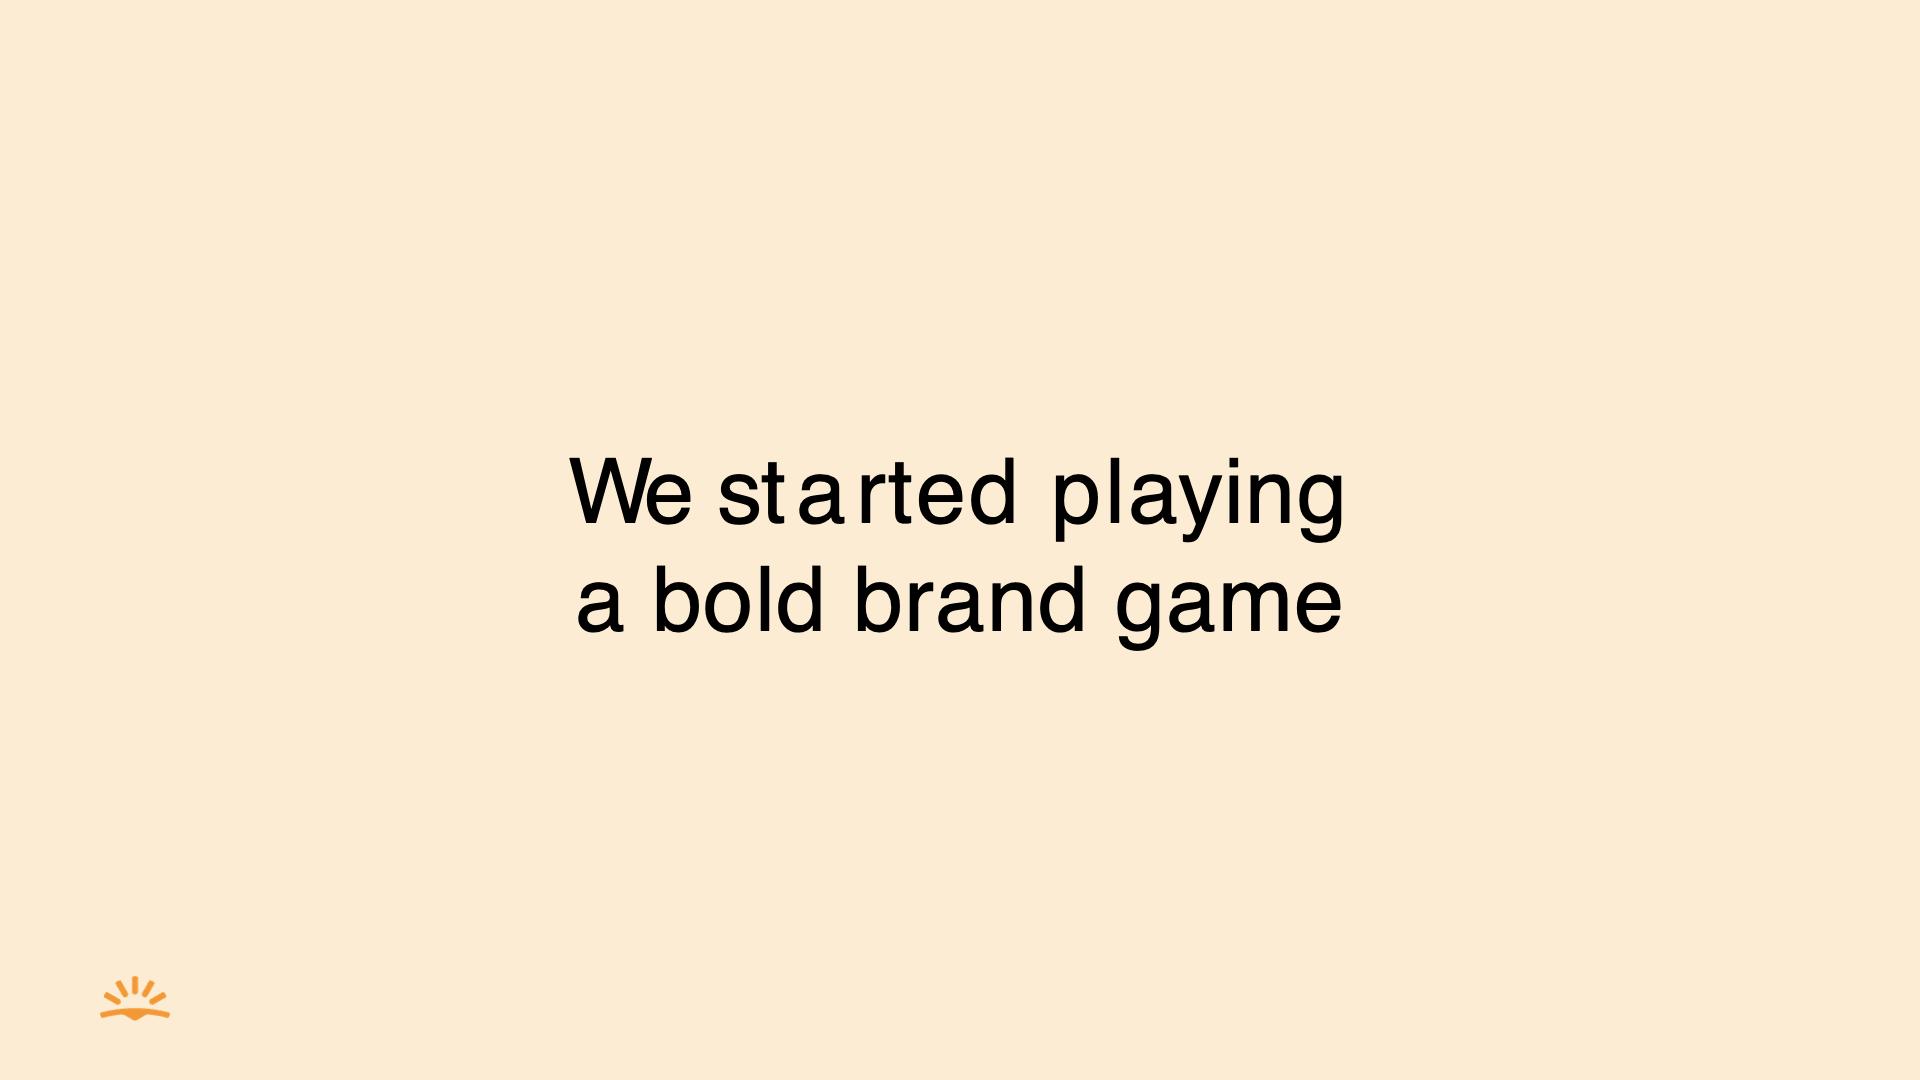 bold brand game